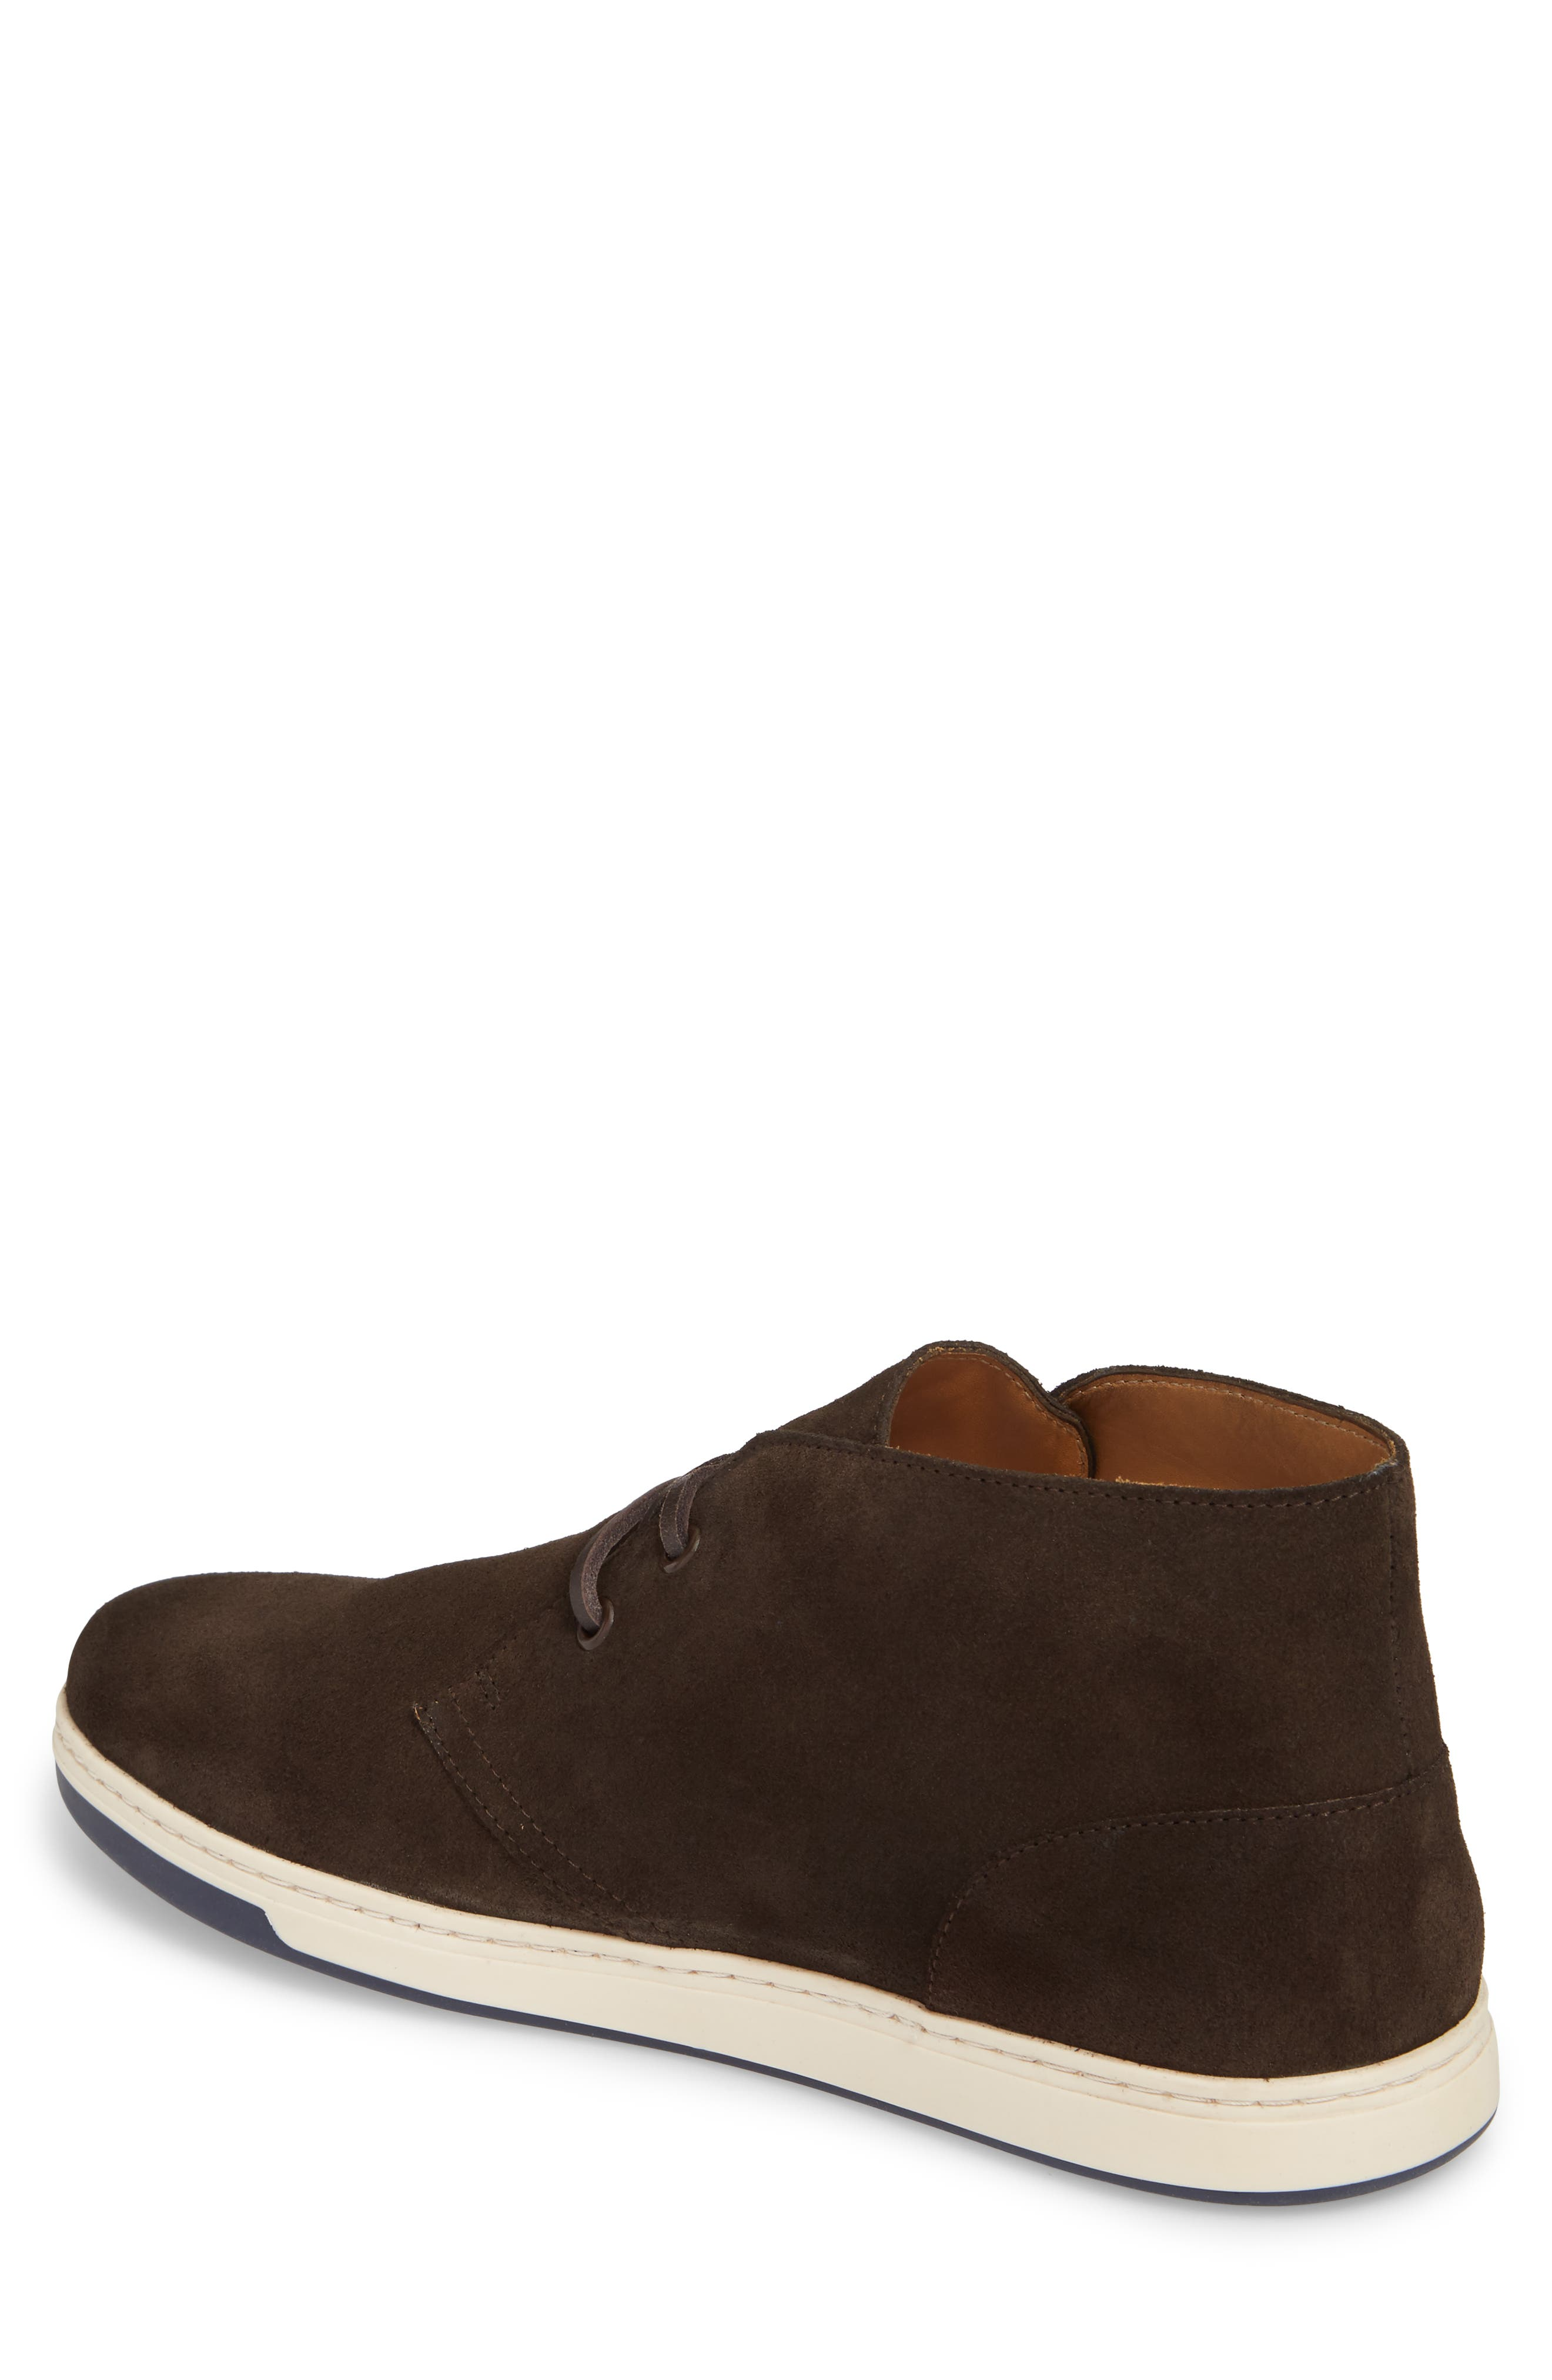 Alternate Image 2  - Austen Heller Berkleys Sneaker (Men)